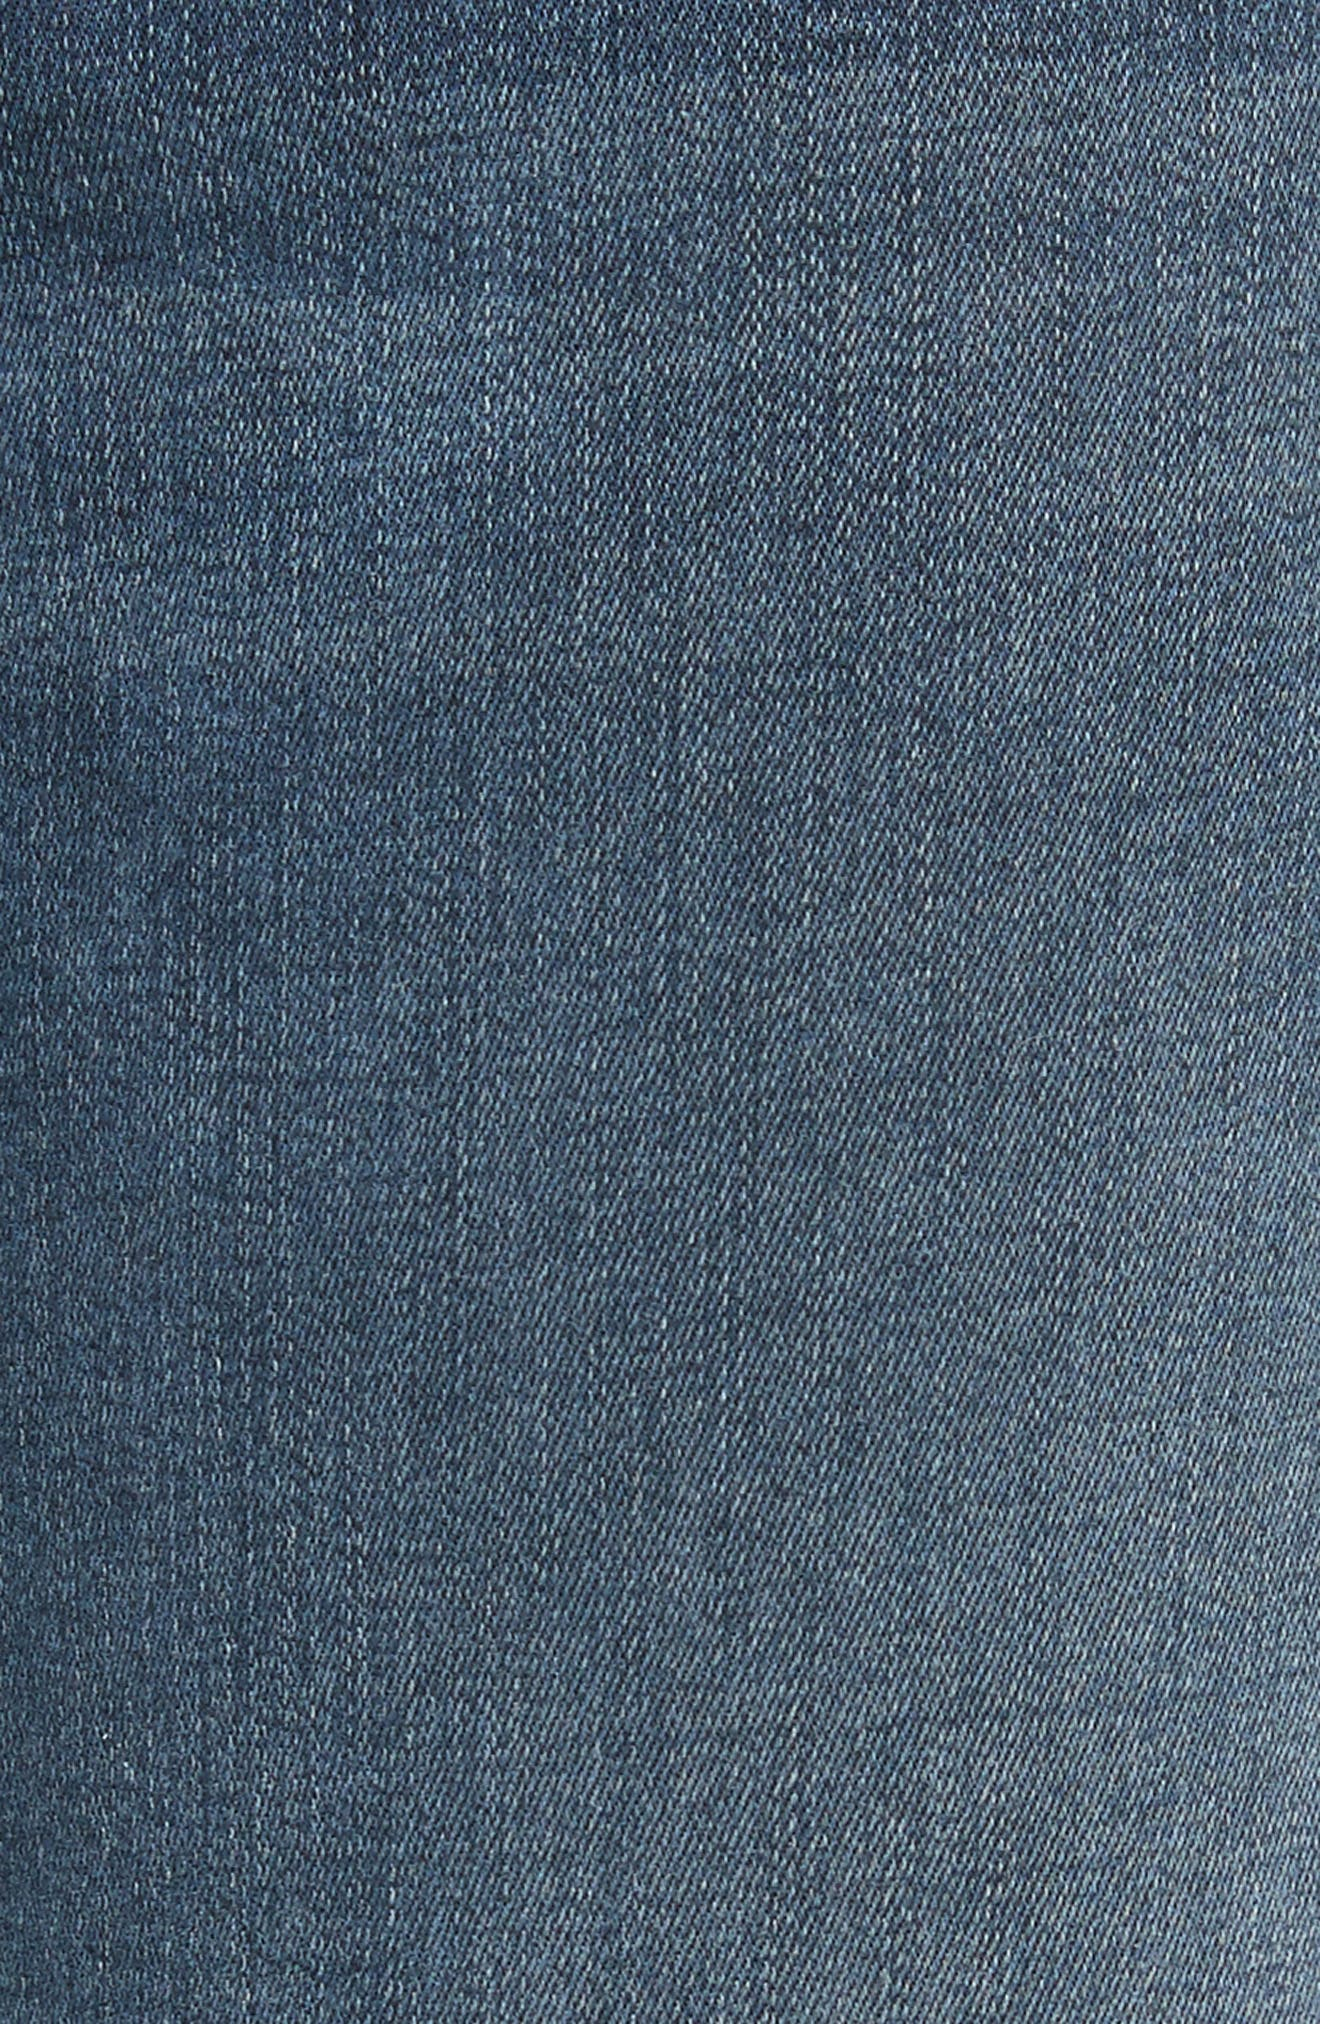 Alternate Image 6  - FRAME Le Crop Mini Boot Stagger Hem Jeans (Fenwick)